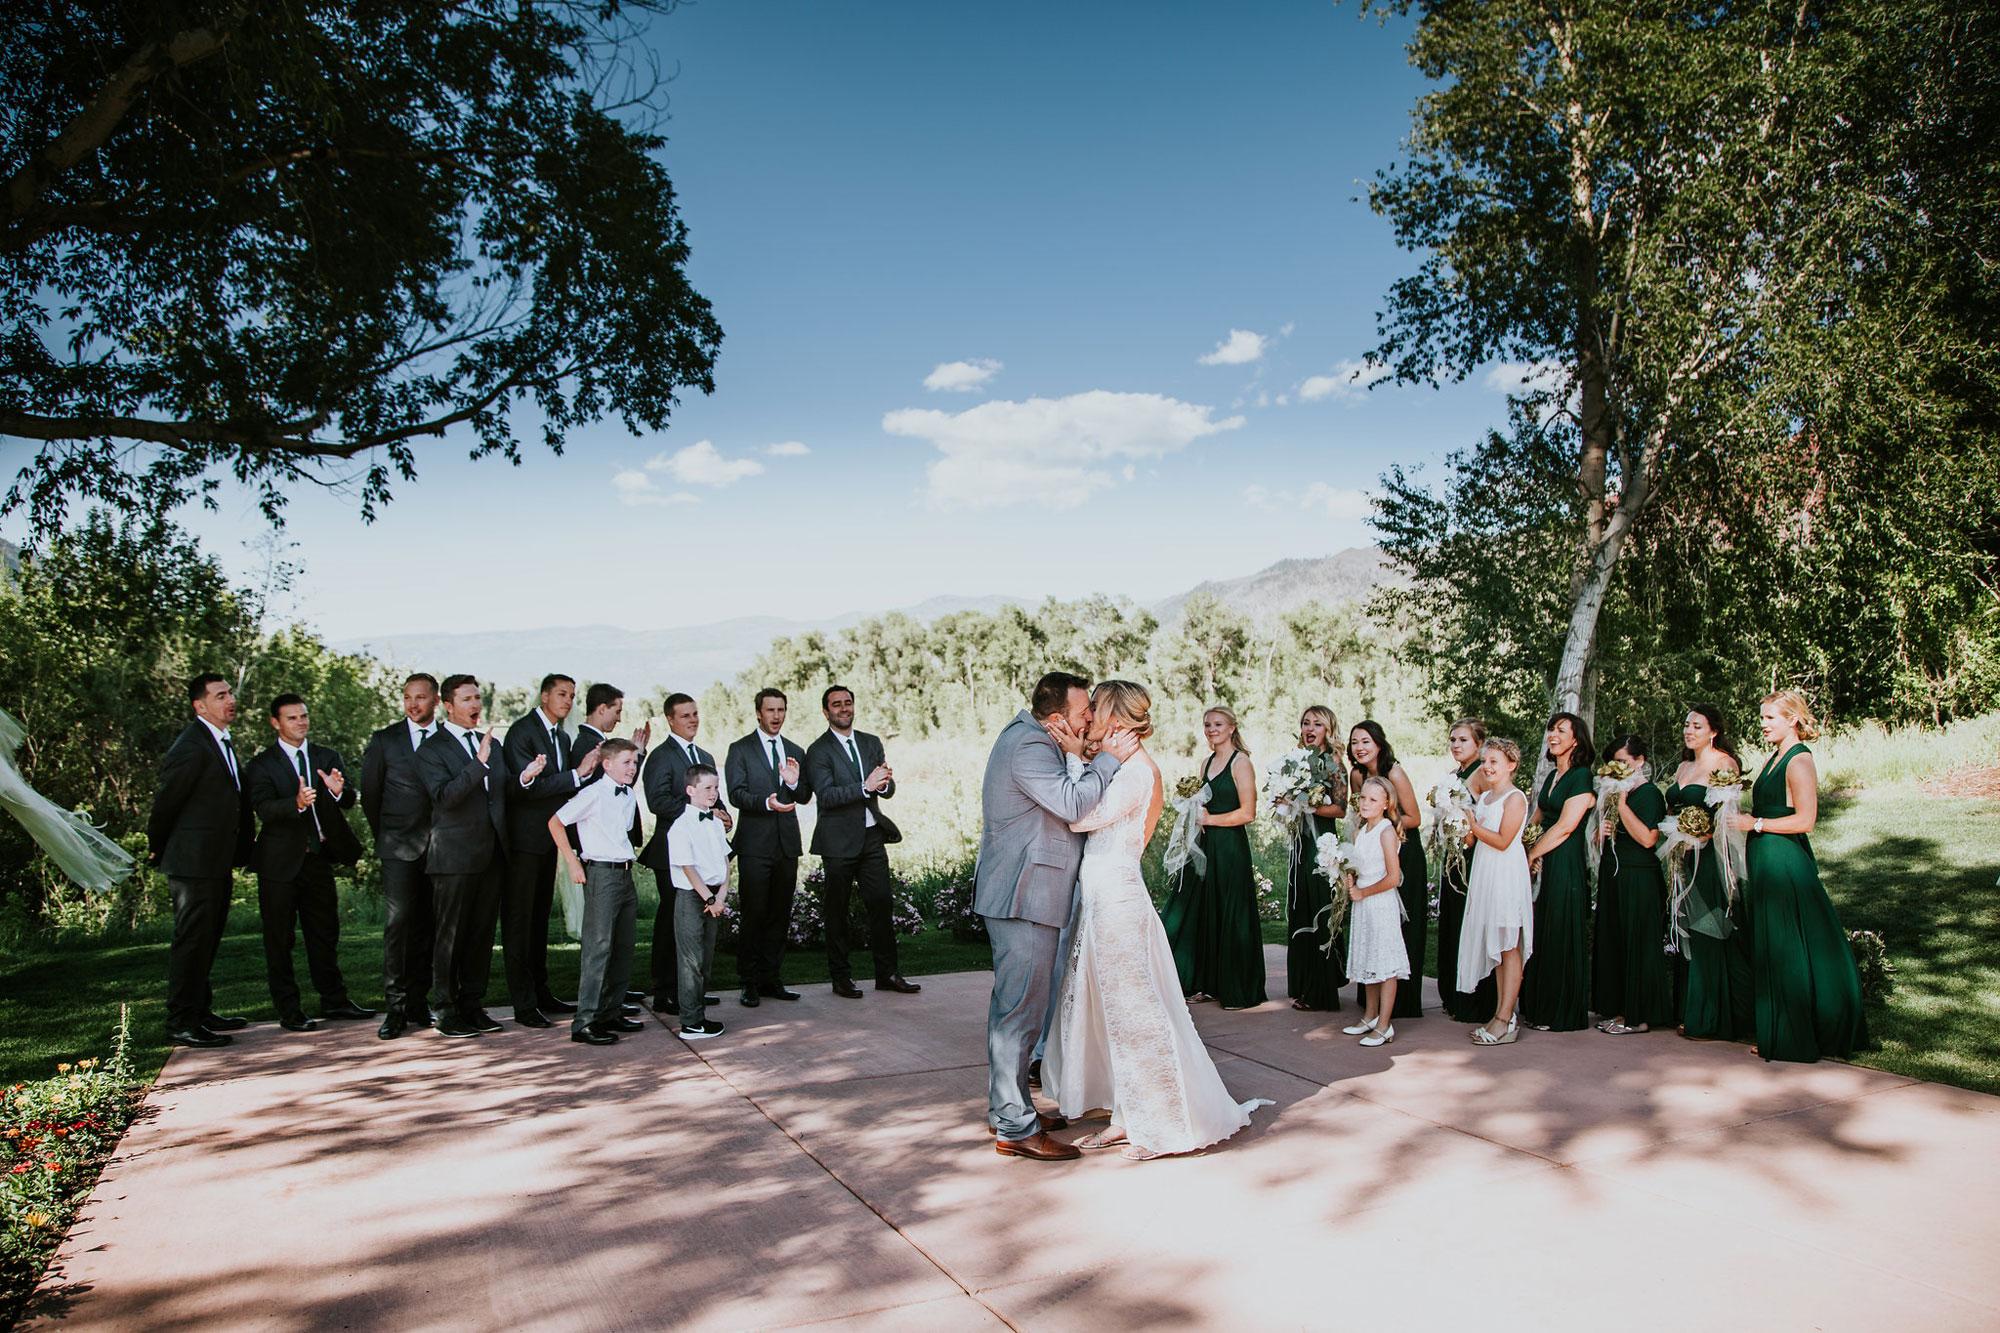 A Simply Elegant Irish Wedding at Dalton Ranch, Durango Colorado